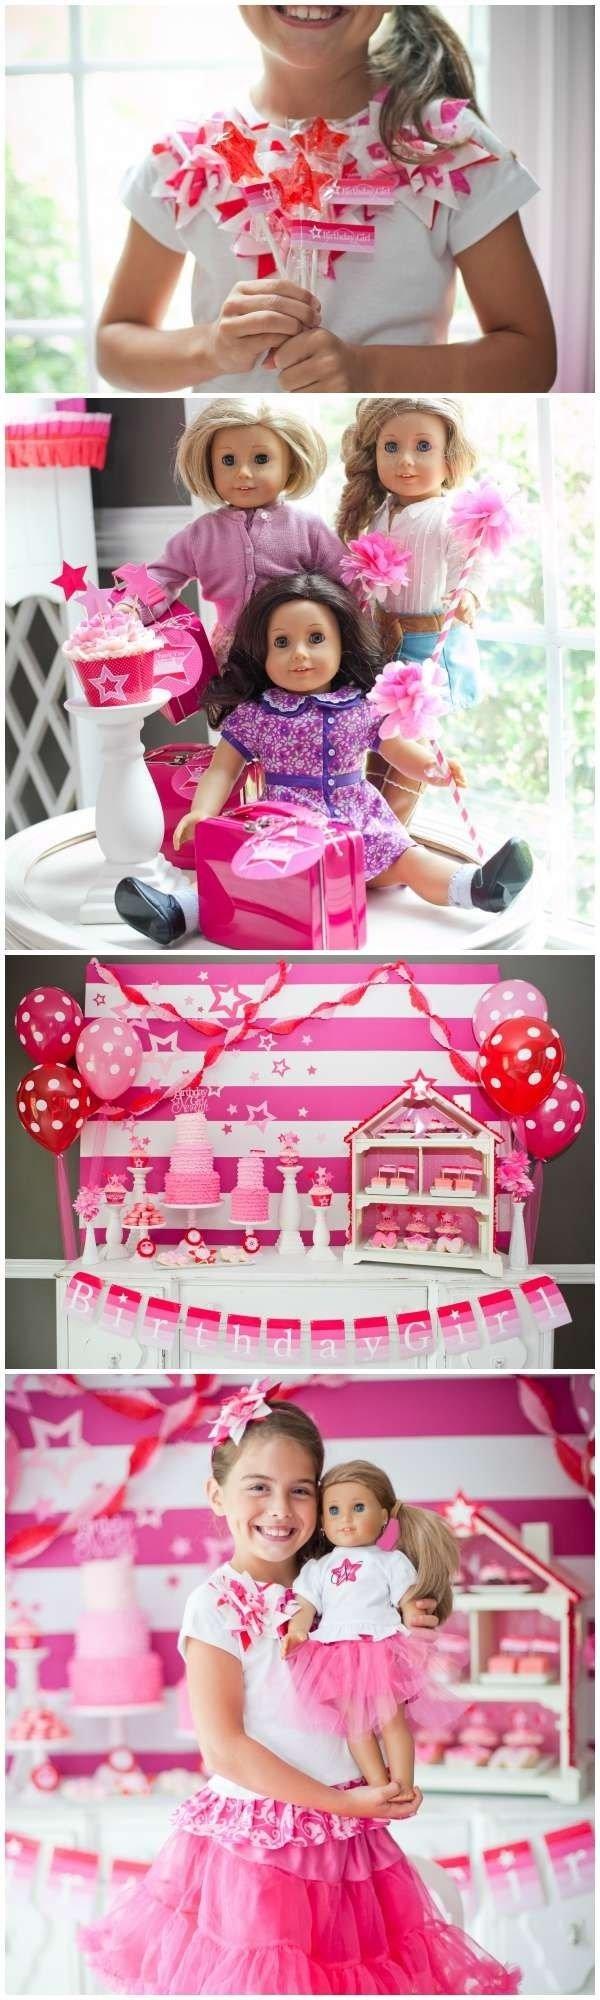 10 great american girl doll birthday party ideas